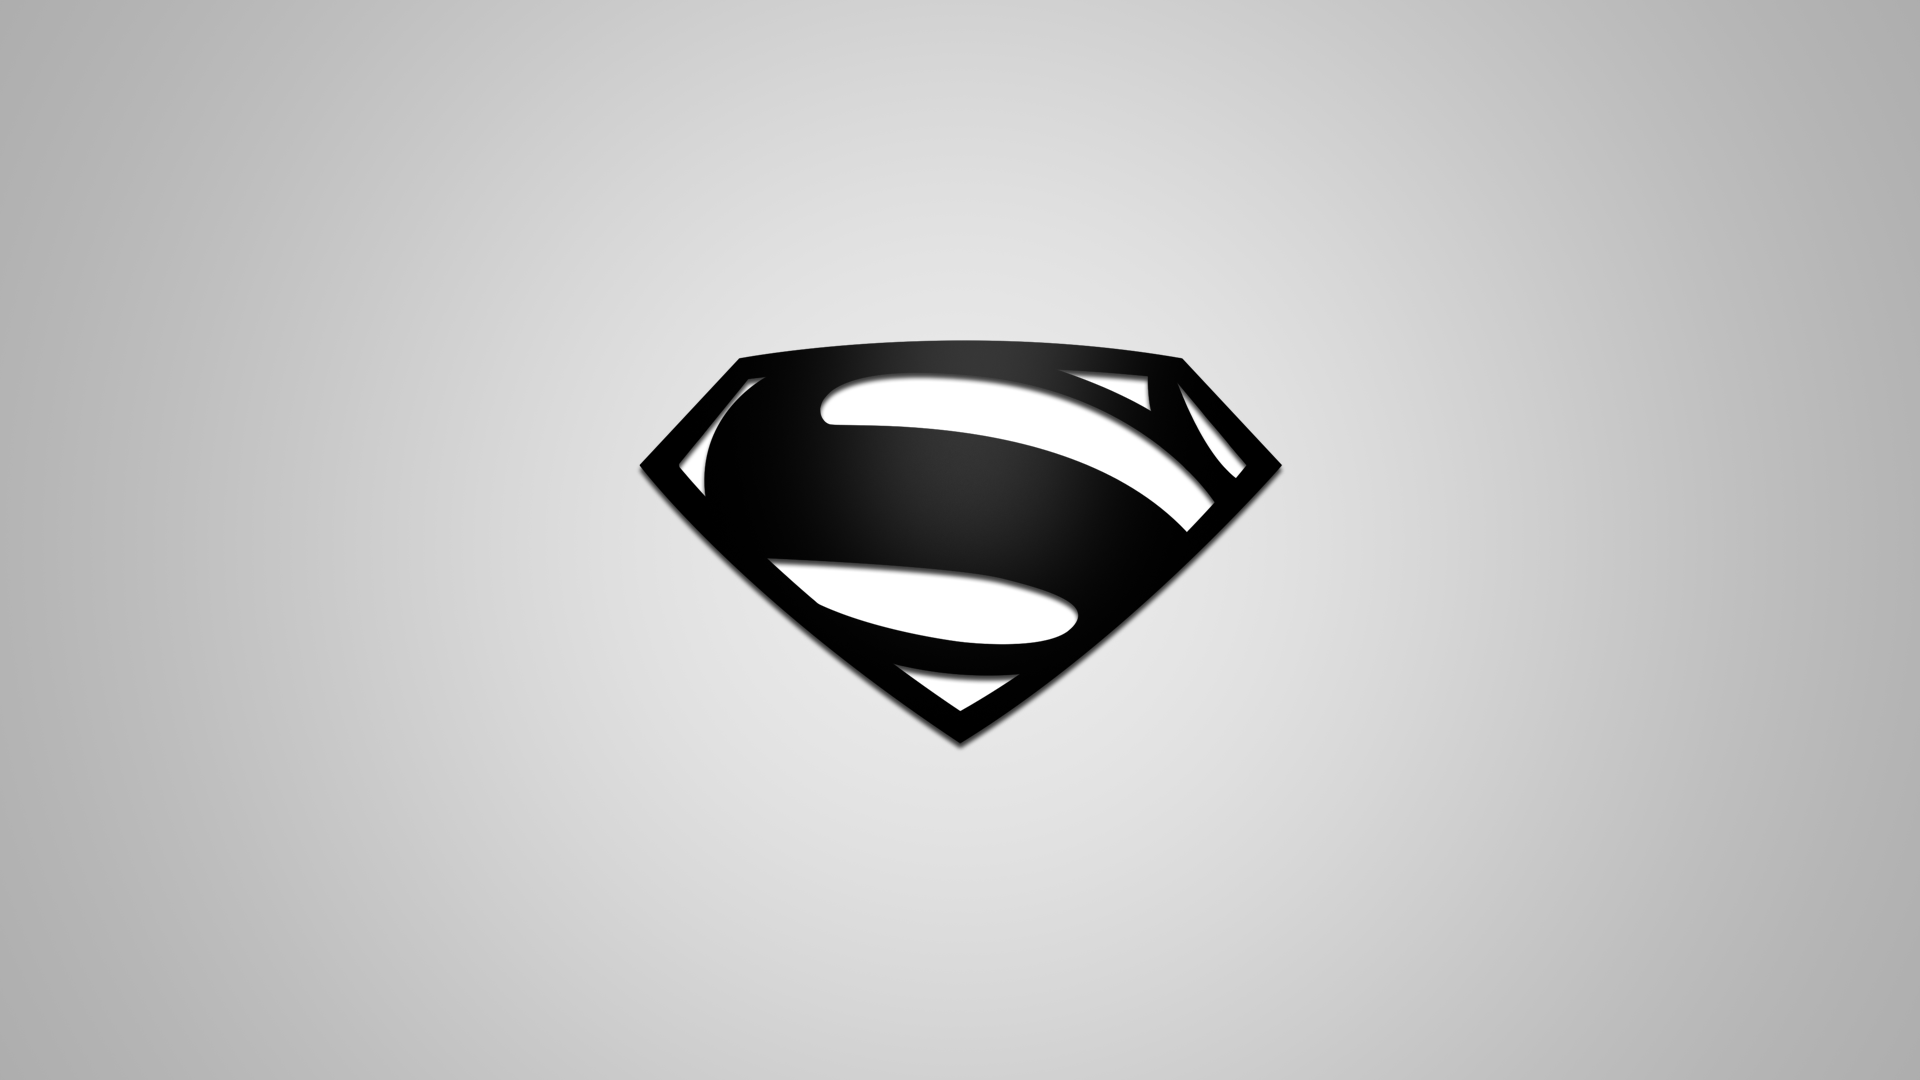 Hd wallpaper superman - Superman Logo Ipad Background Free Download Wallpapers